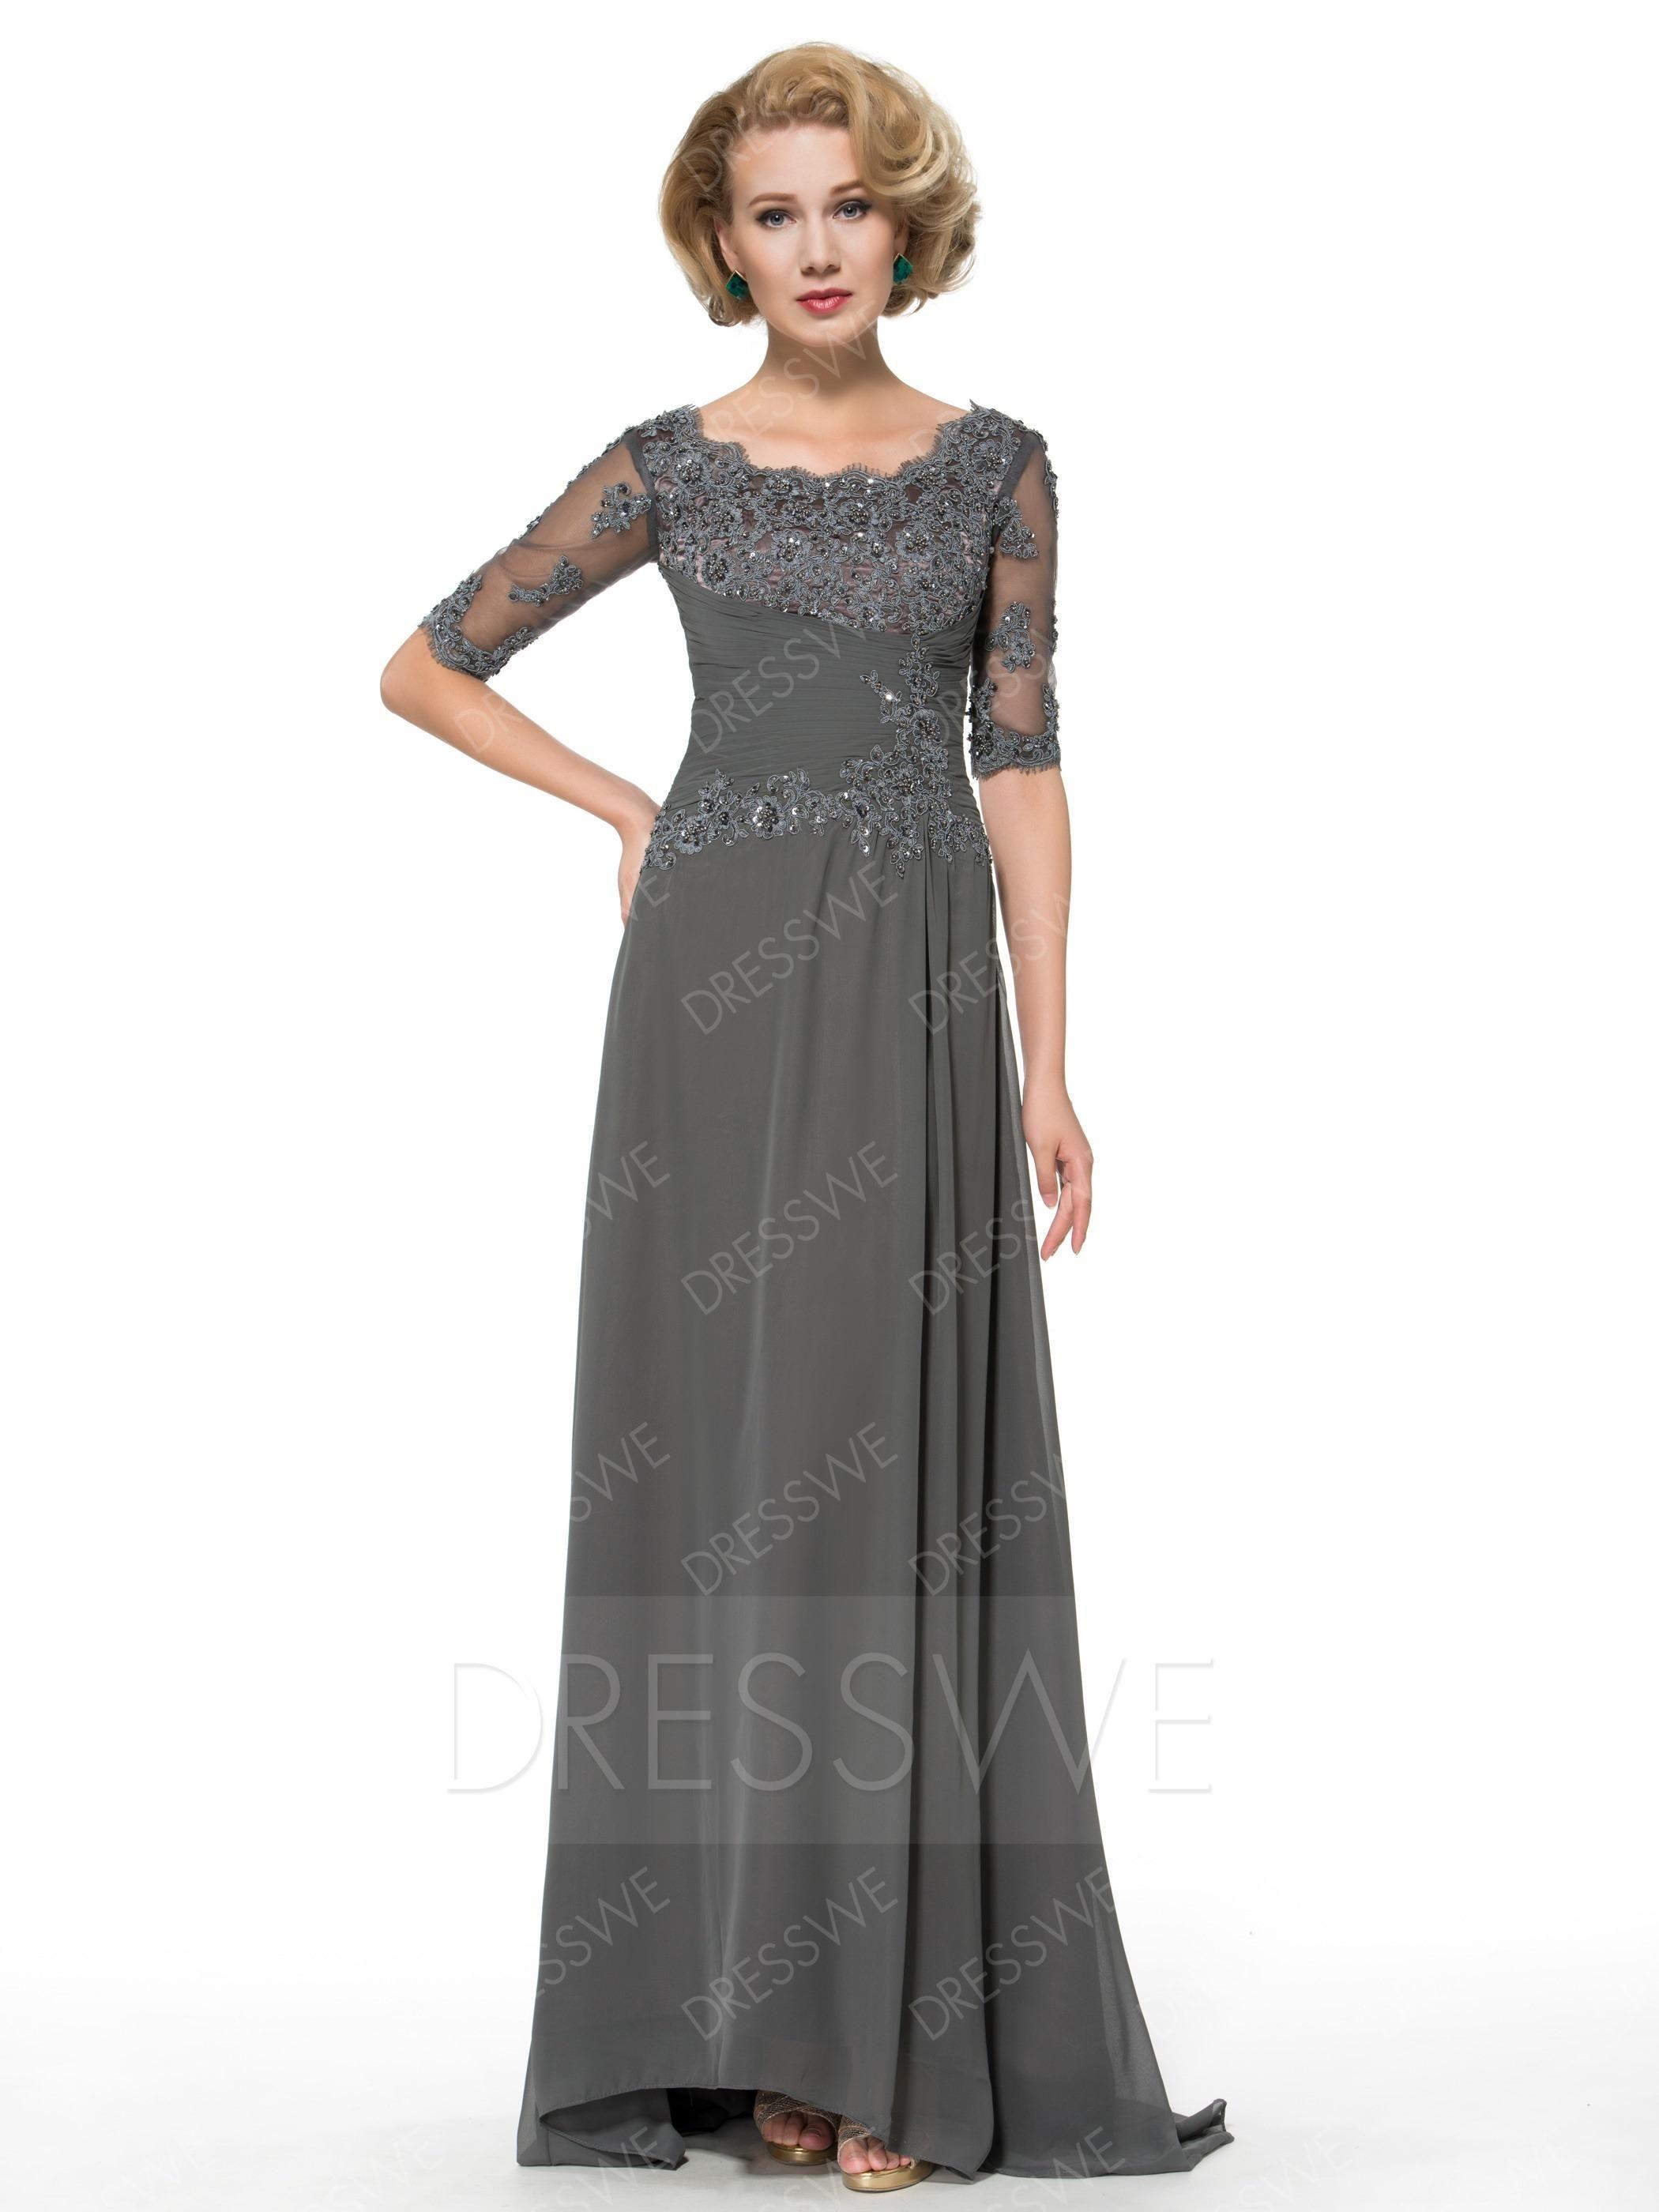 Dresswe dresswe lace beading midsleeves mother of the bride dress